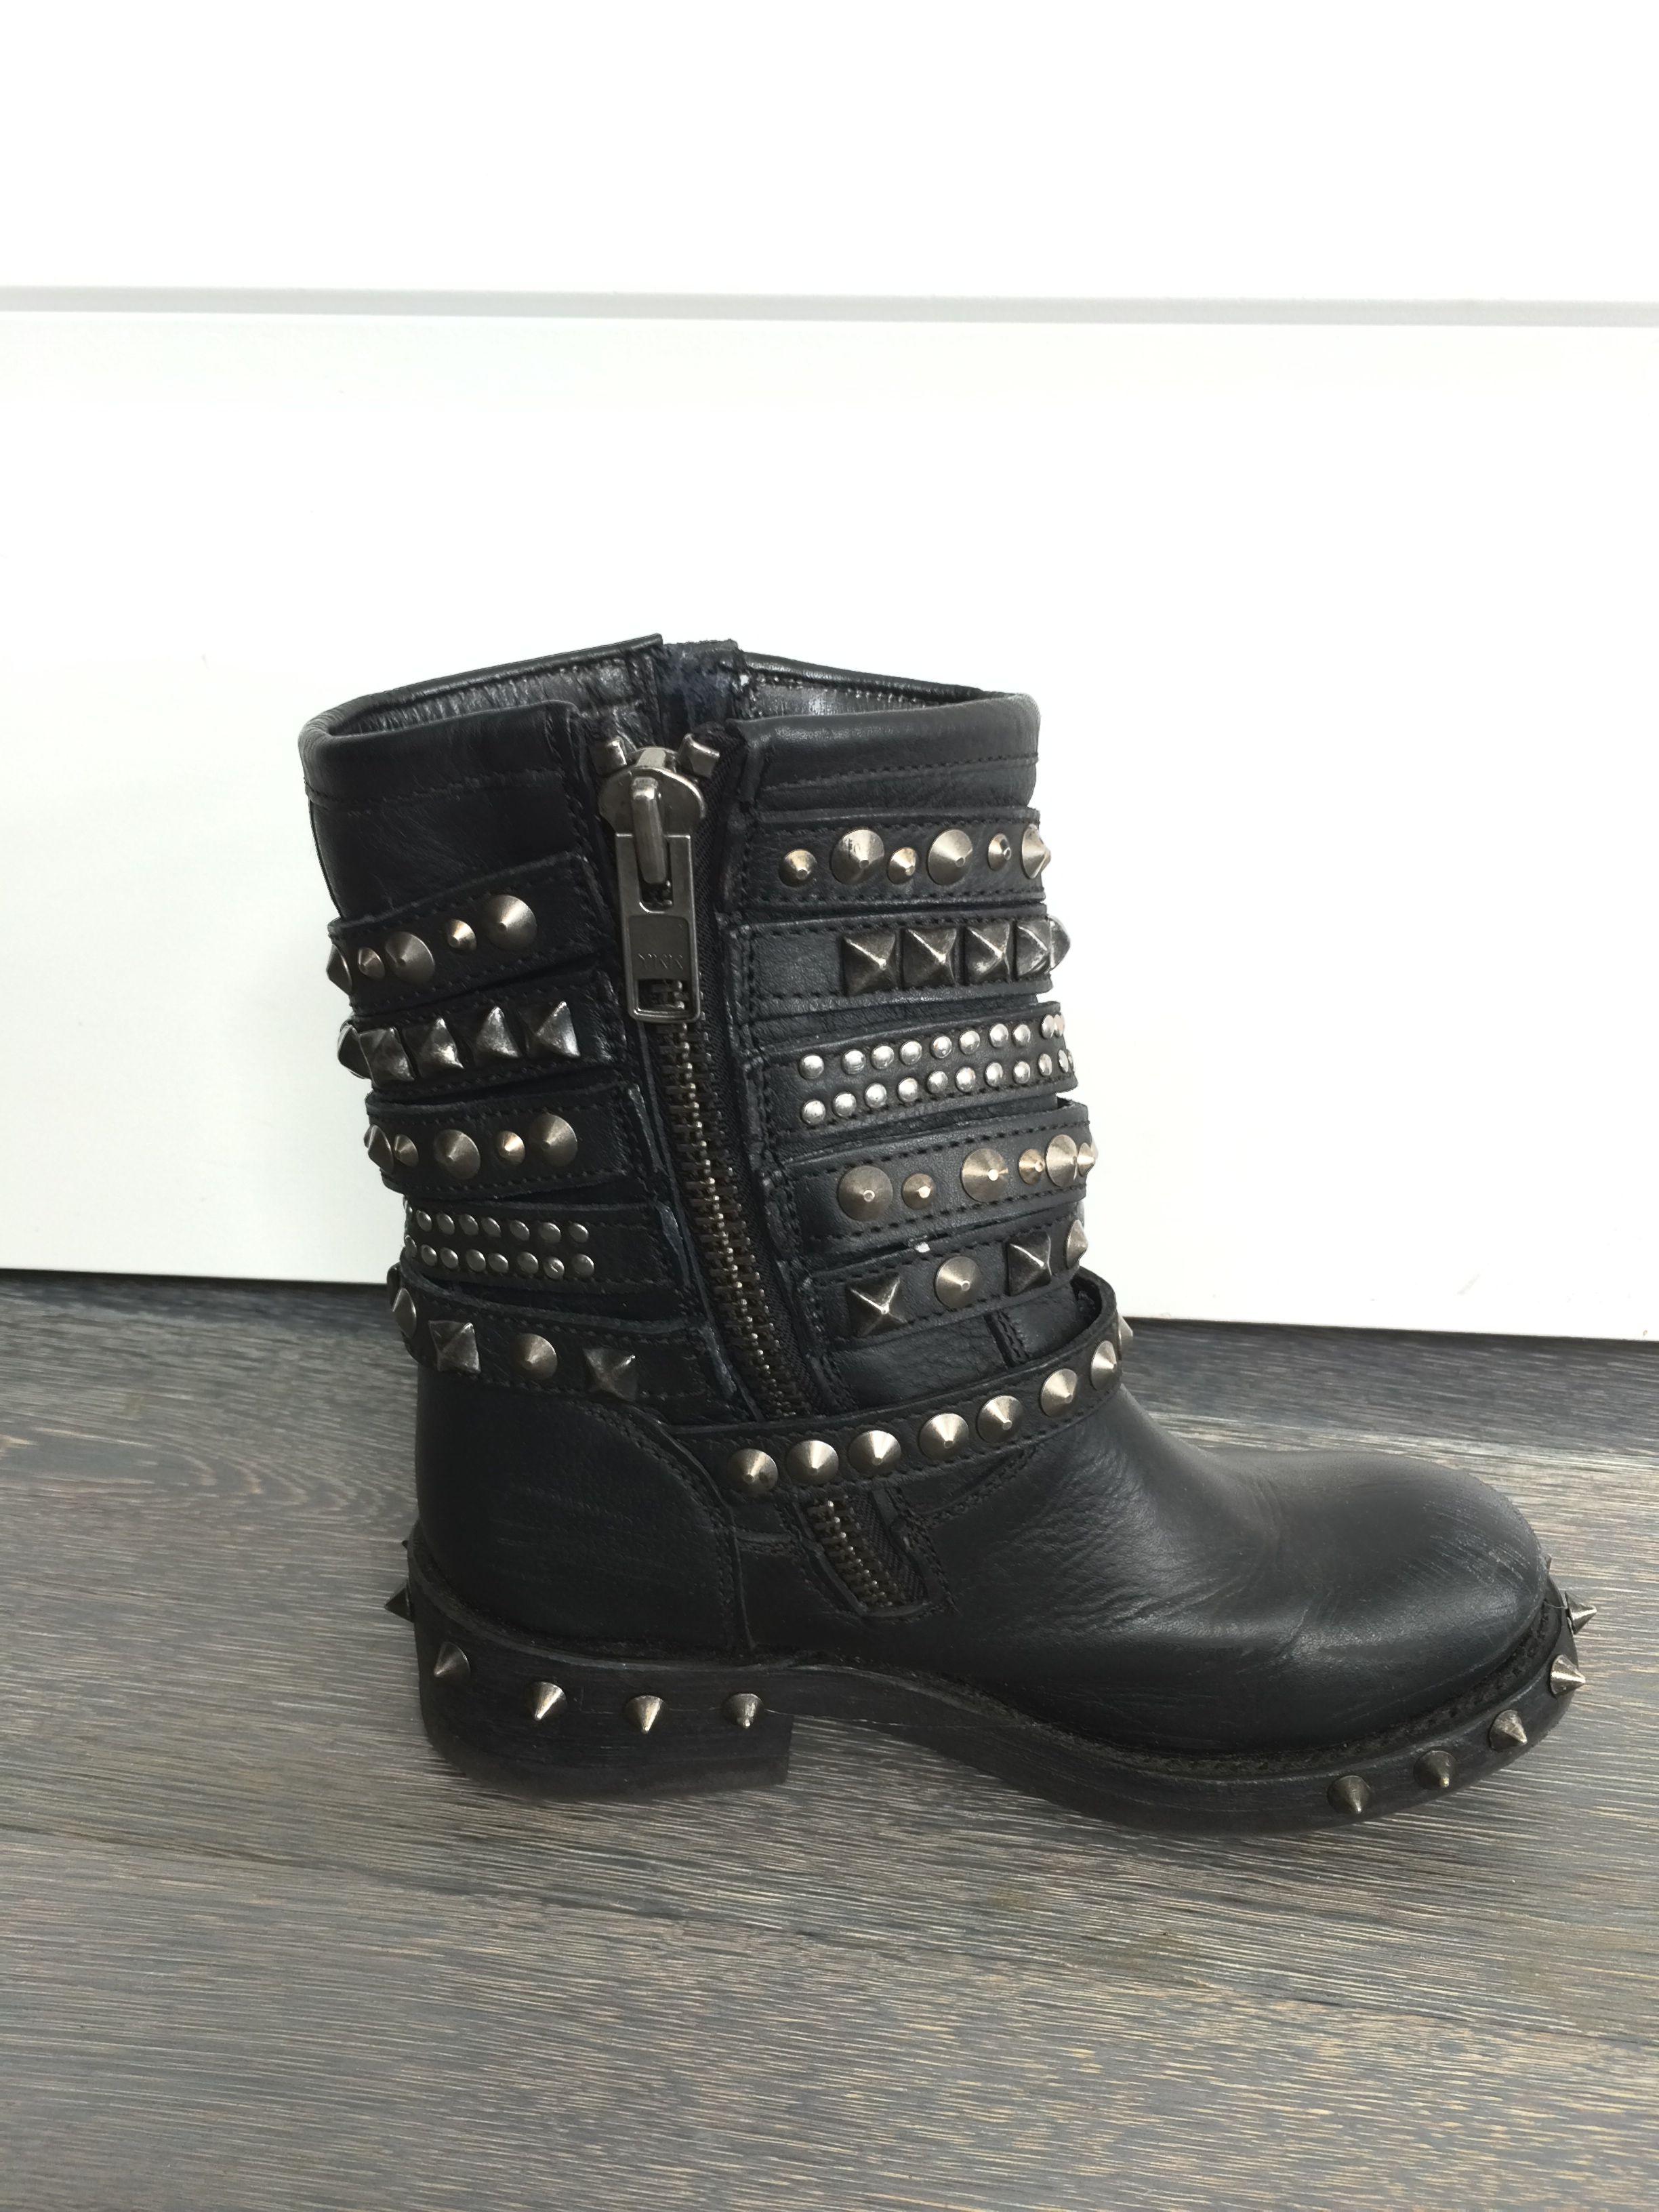 Ash boots   Ash boots, Boots, Biker boot